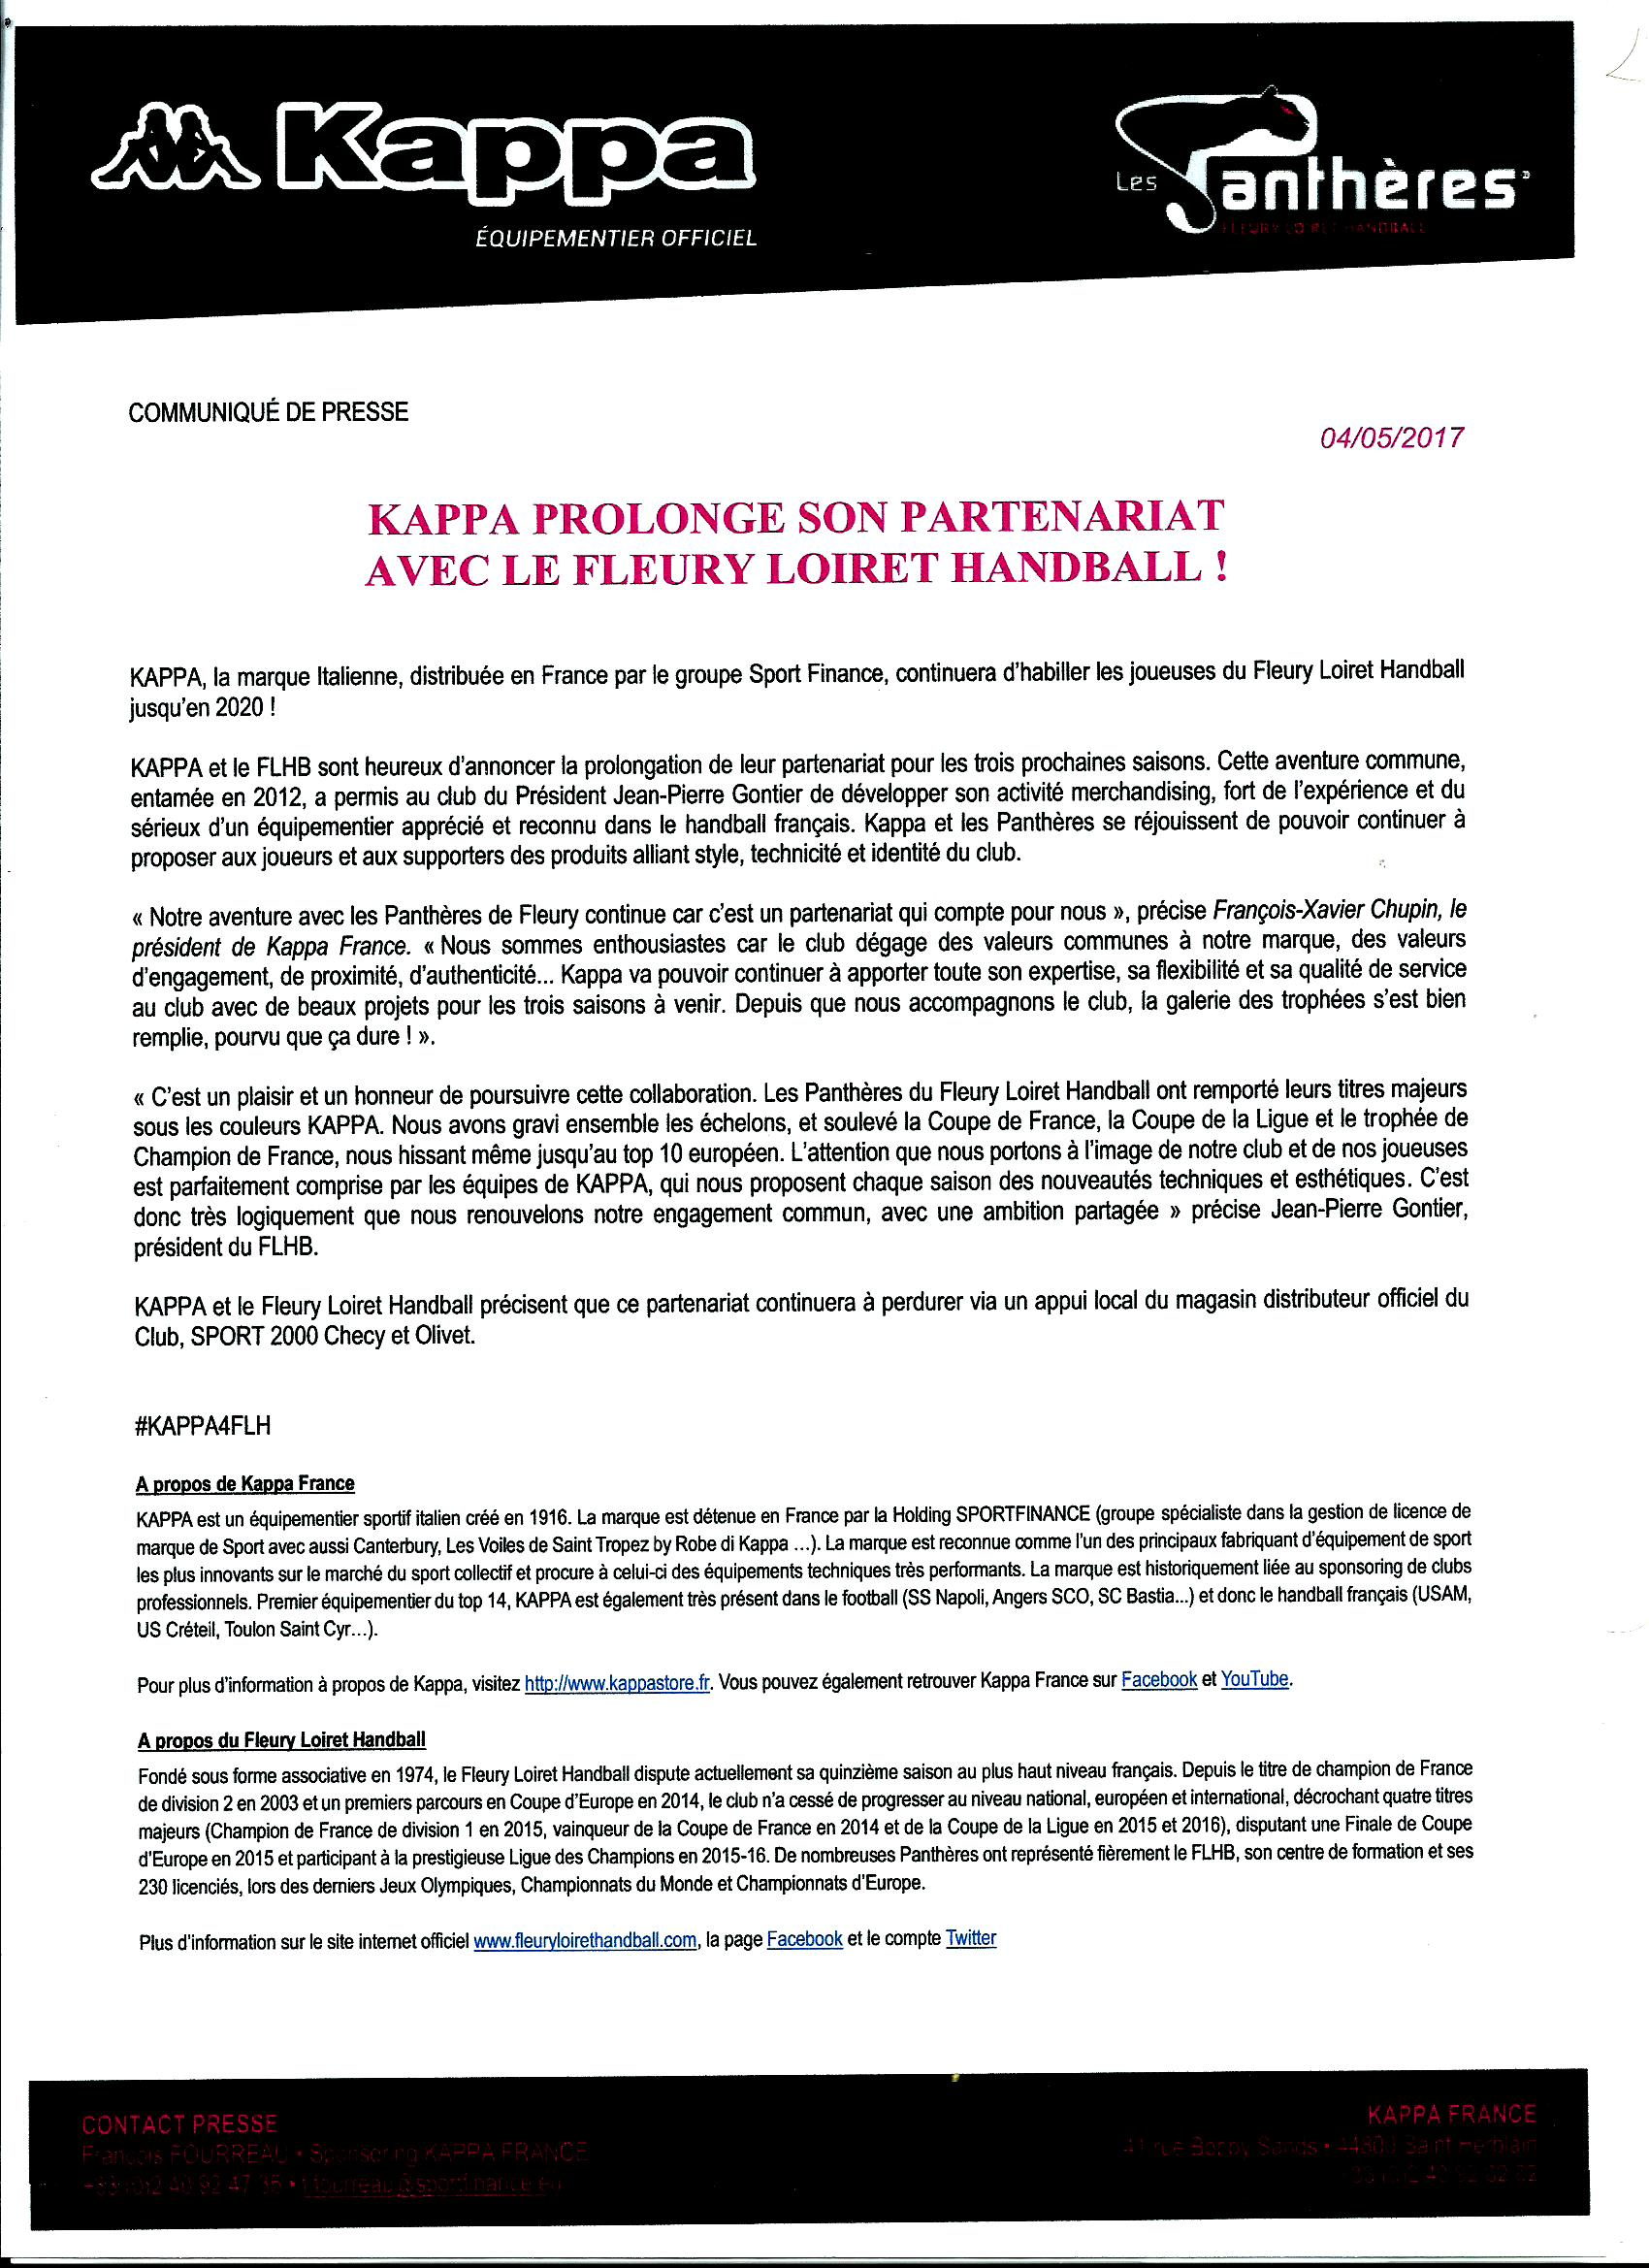 Scan Communiqué de presse Fleury Loiret Handball (04.05.2017).jpg